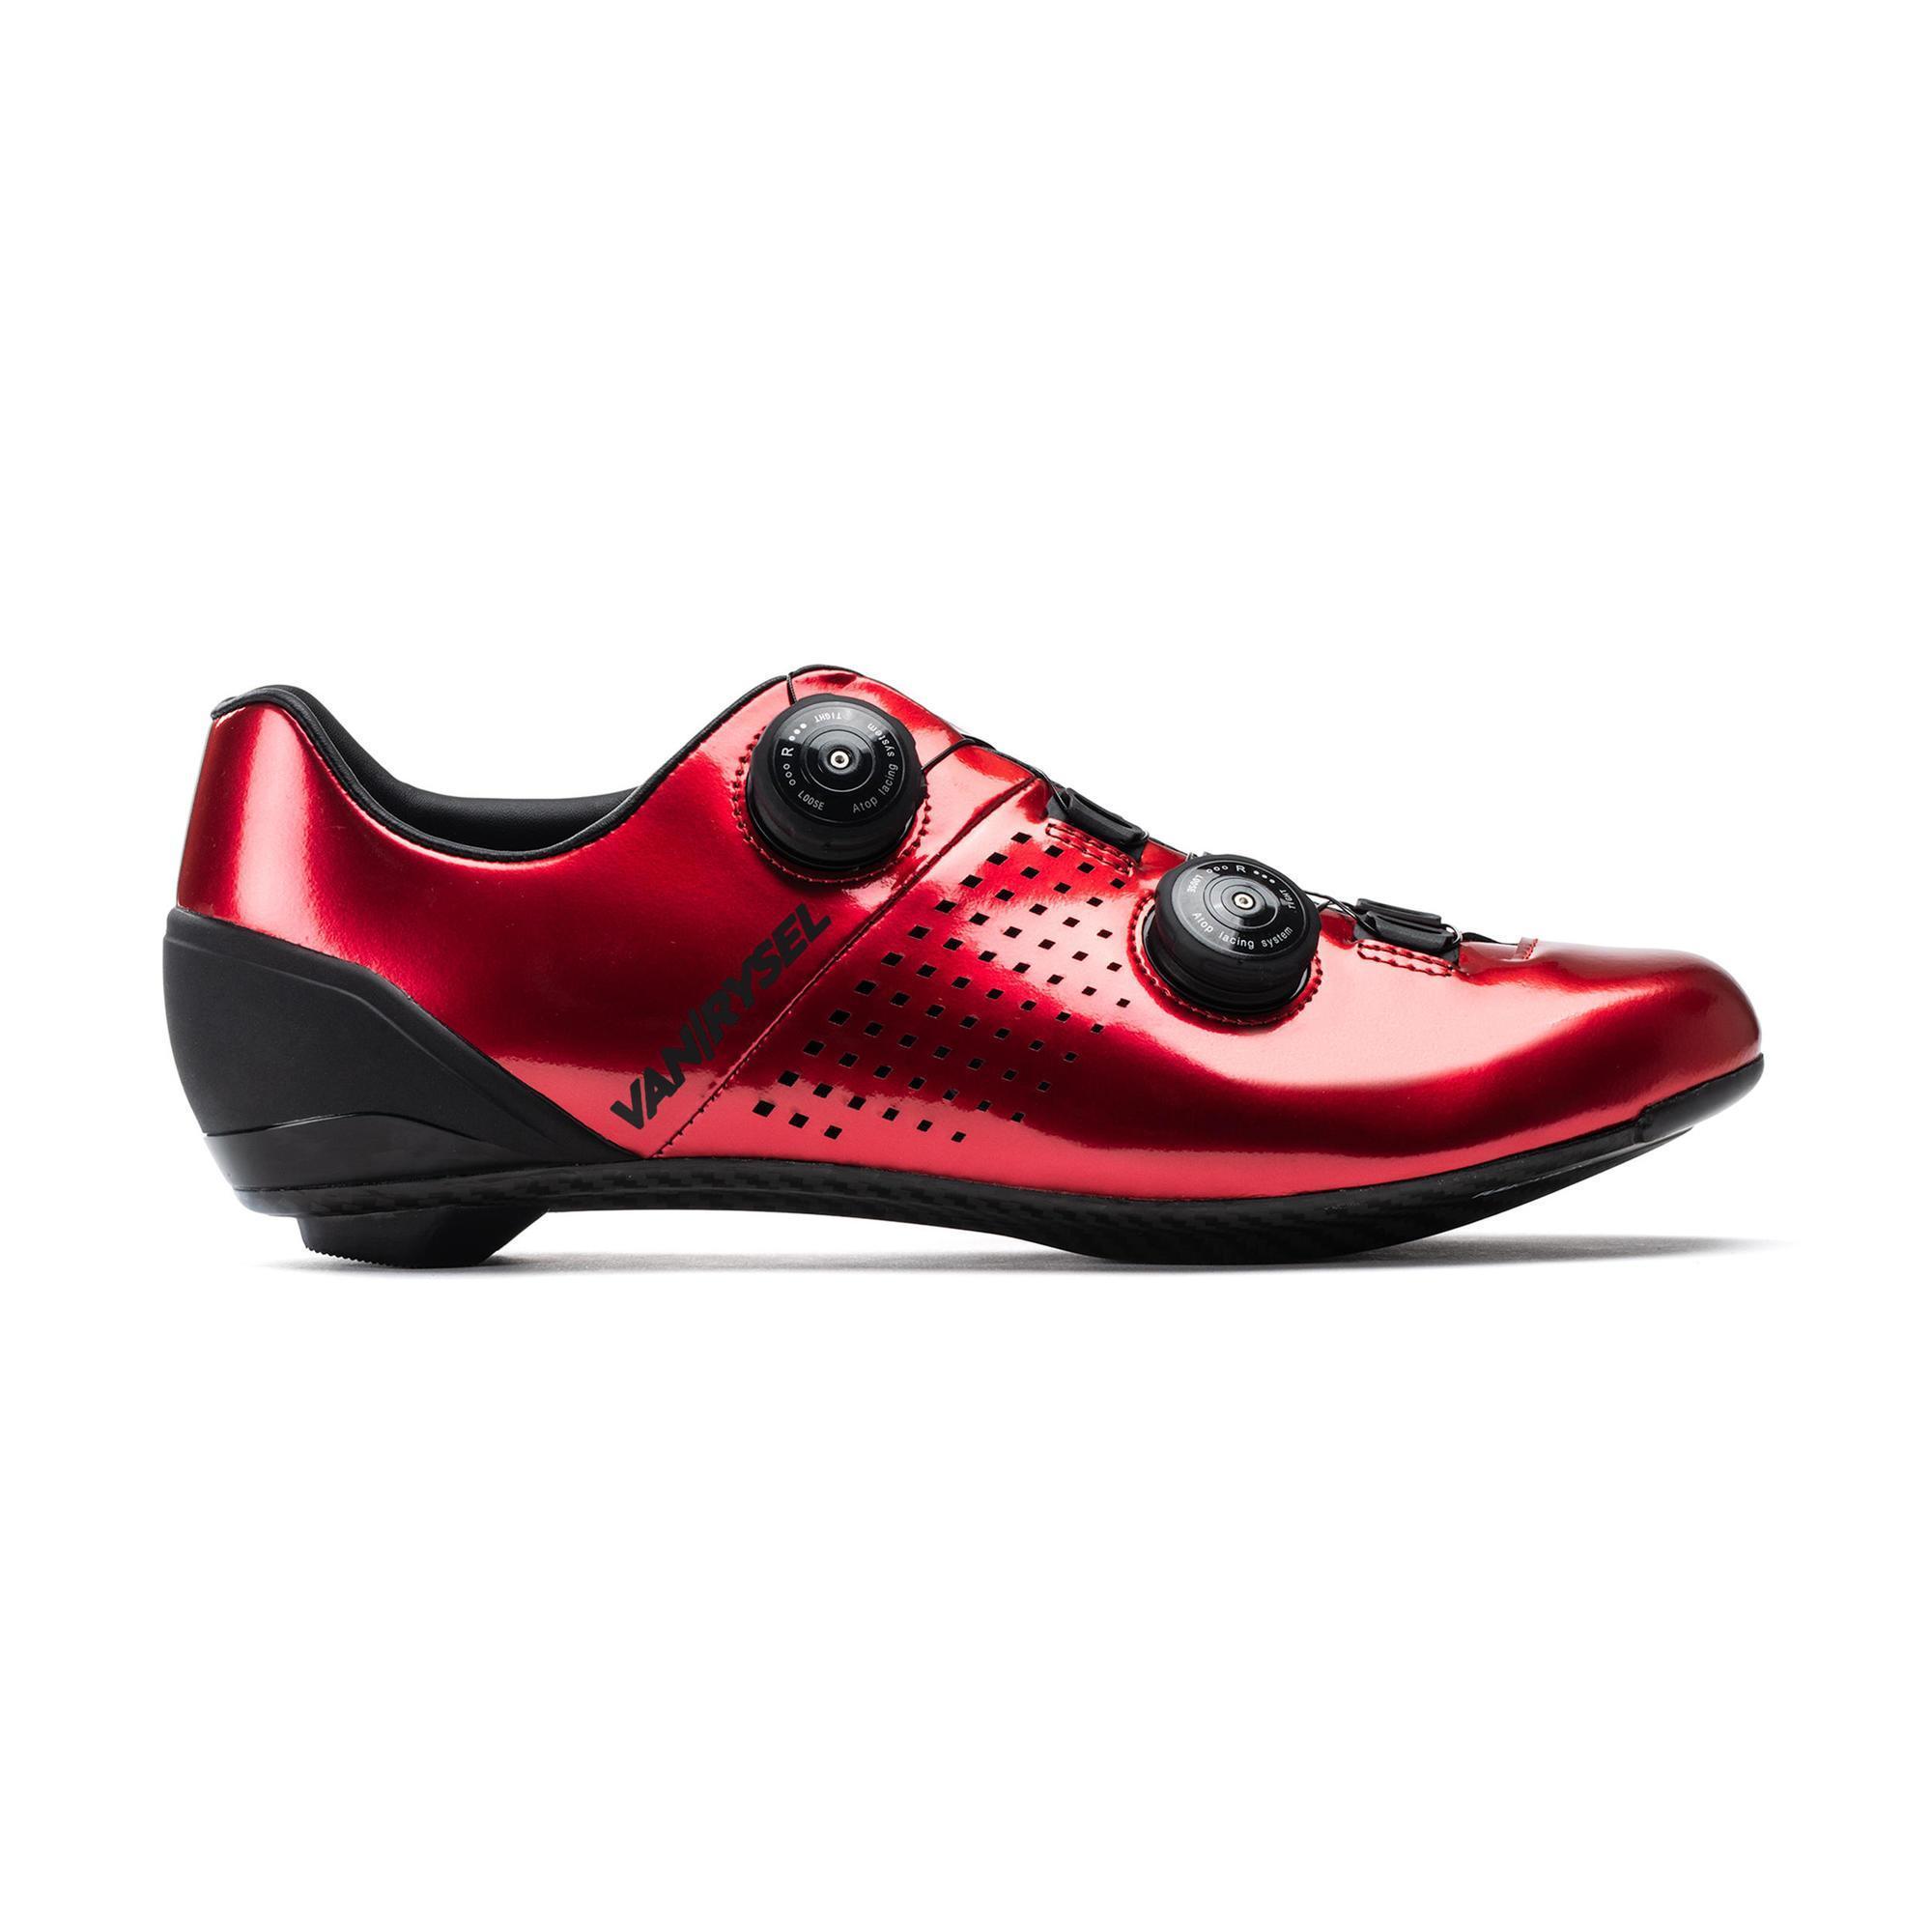 Fahrrad-Schuhe Rennrad Van Rysel RR 900 | Schuhe > Sportschuhe | Van rysel